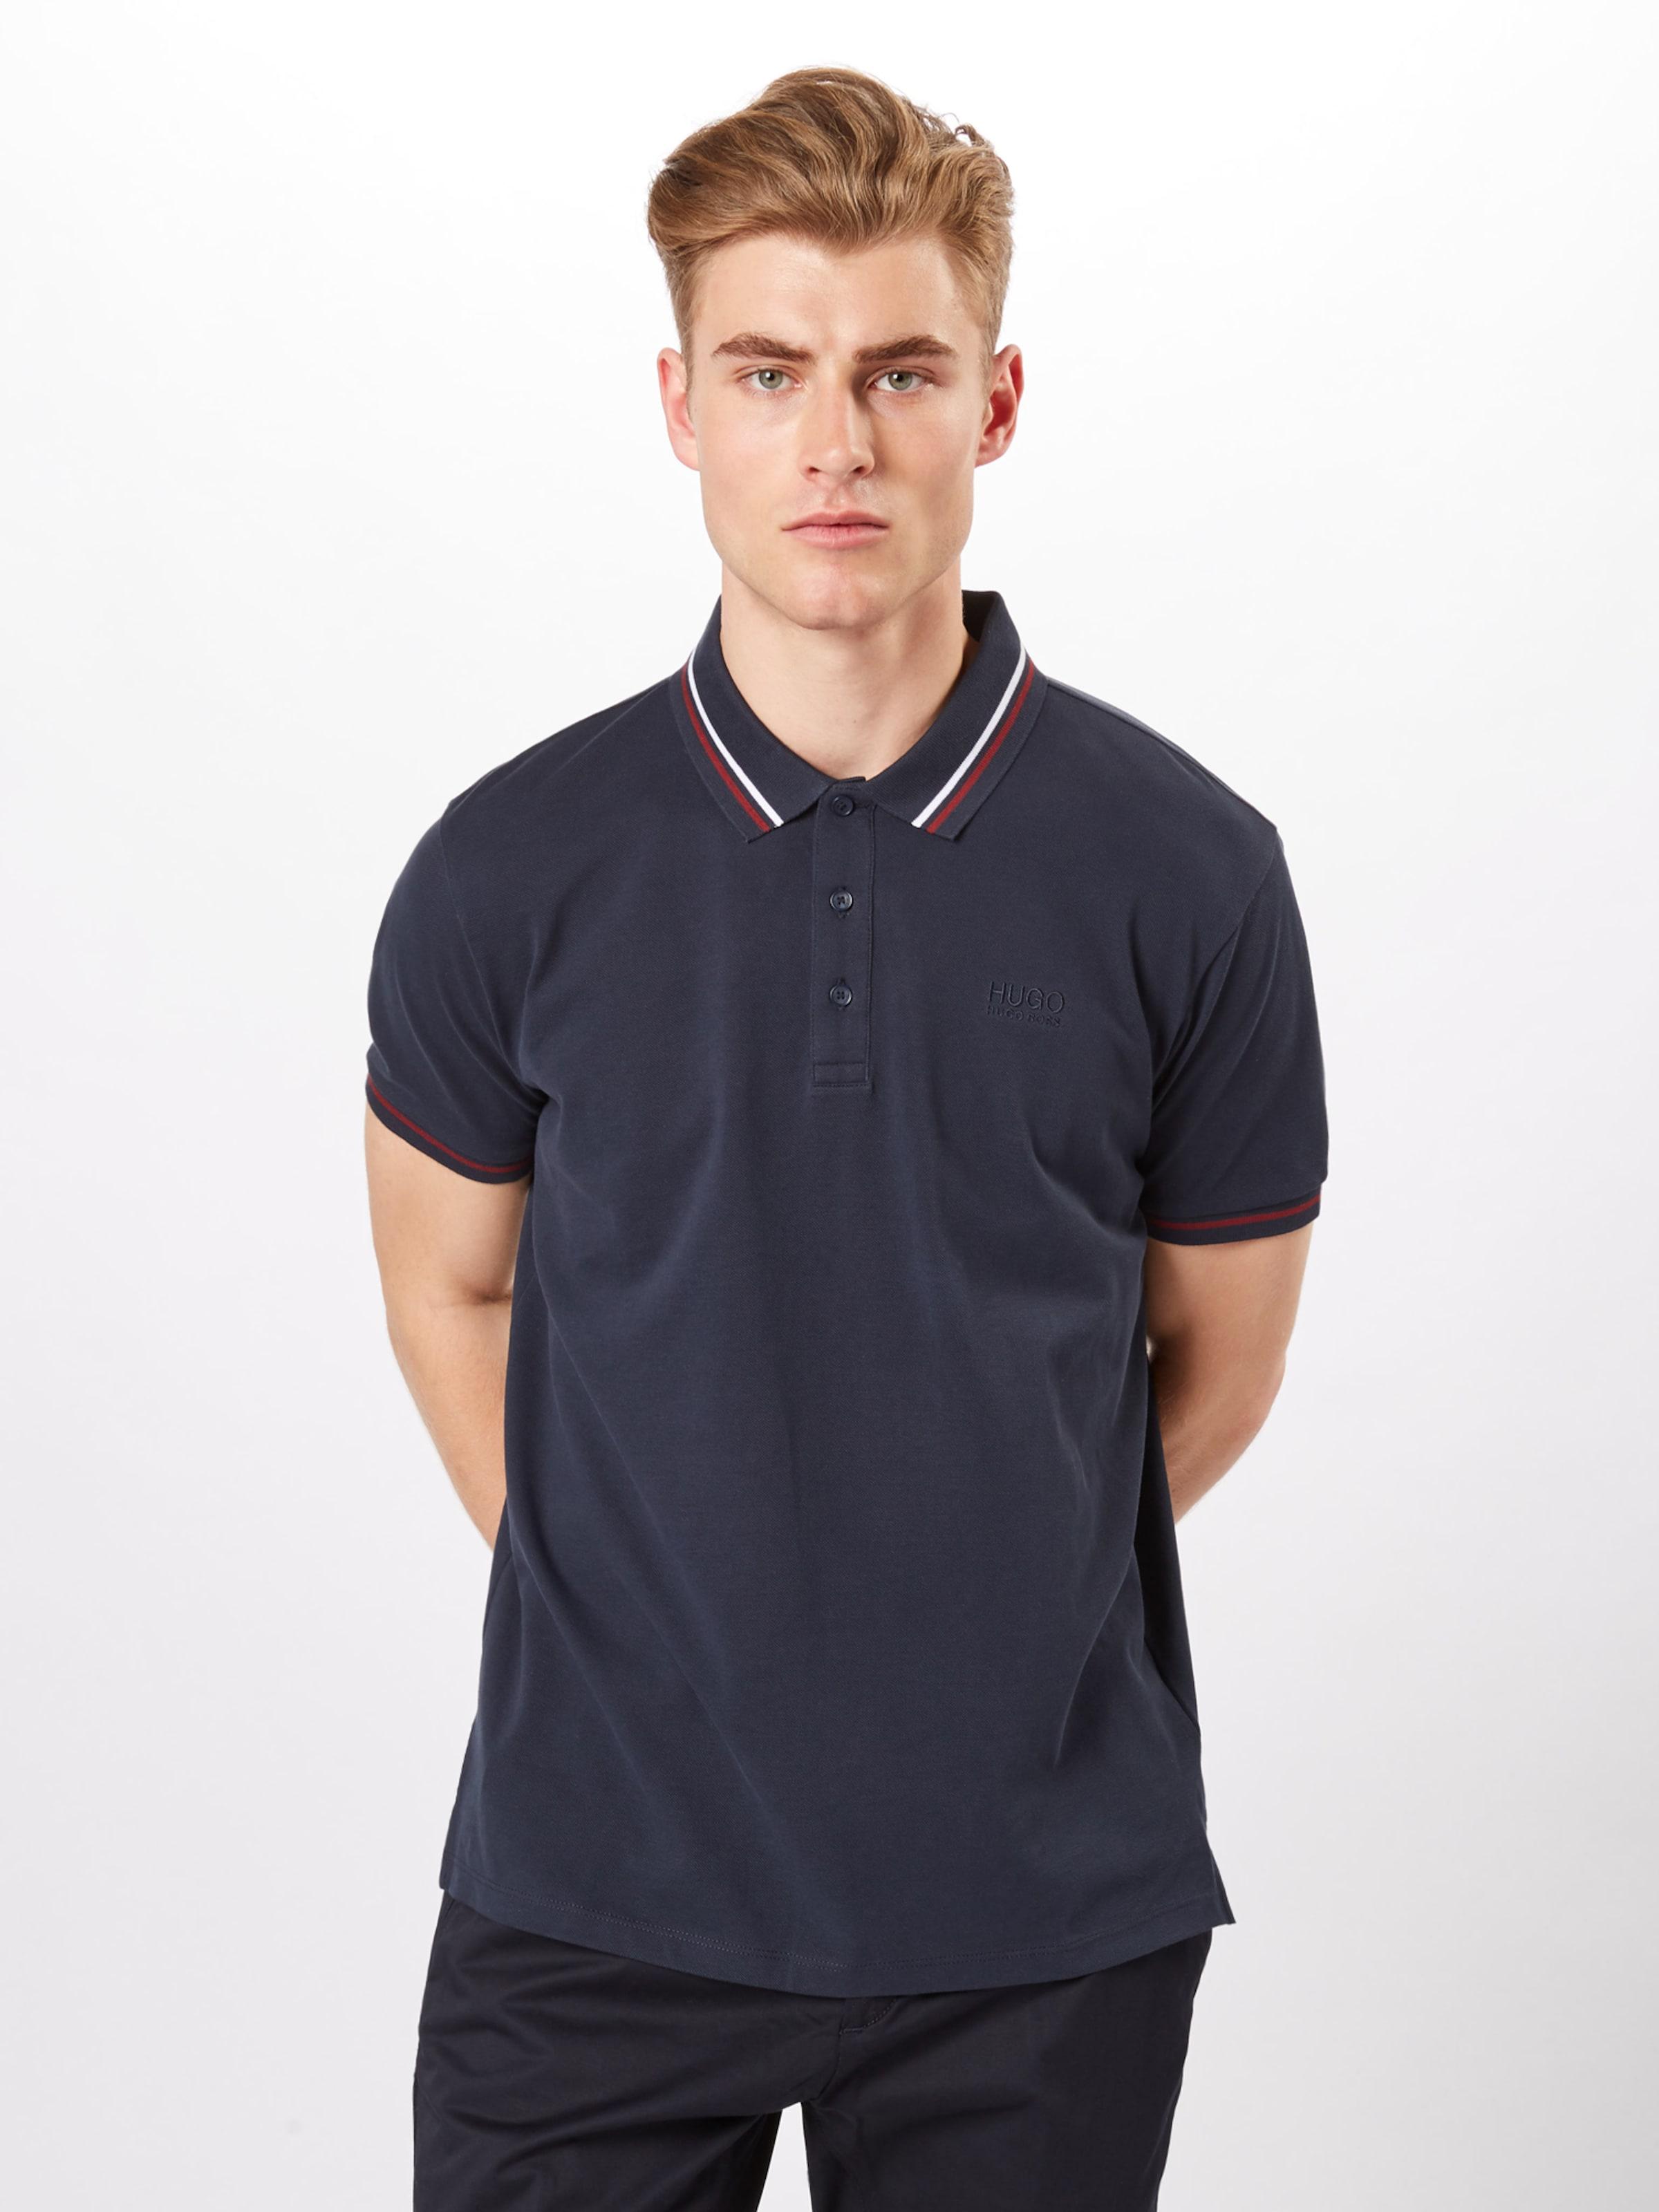 En Hugo 'daruso Rouge T shirt u1' OnN8v0mw